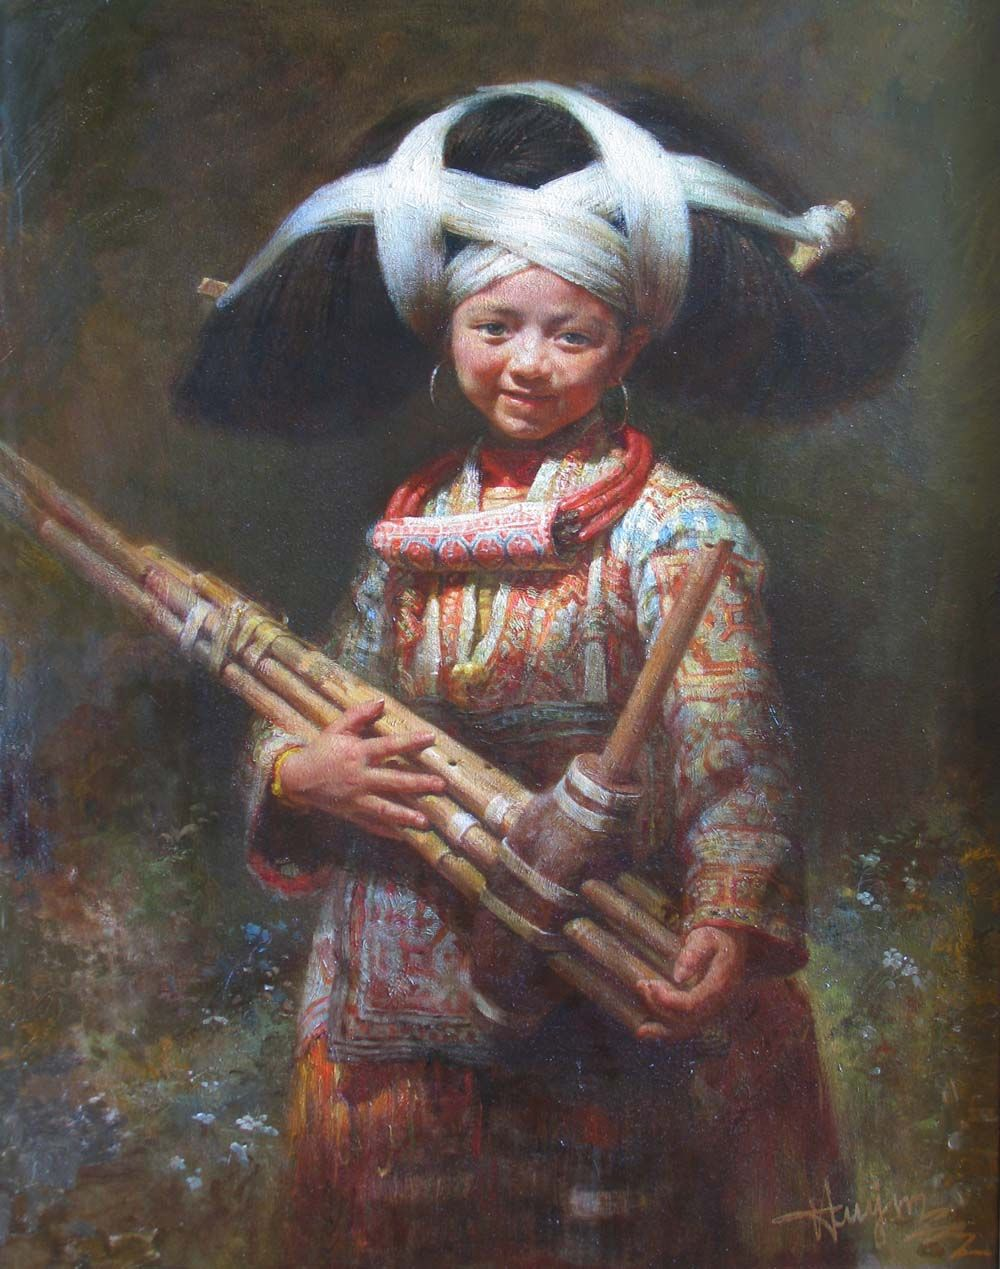 Pin by Shen Lauj on Hmong (Miao) People | Pinterest Miao People Art